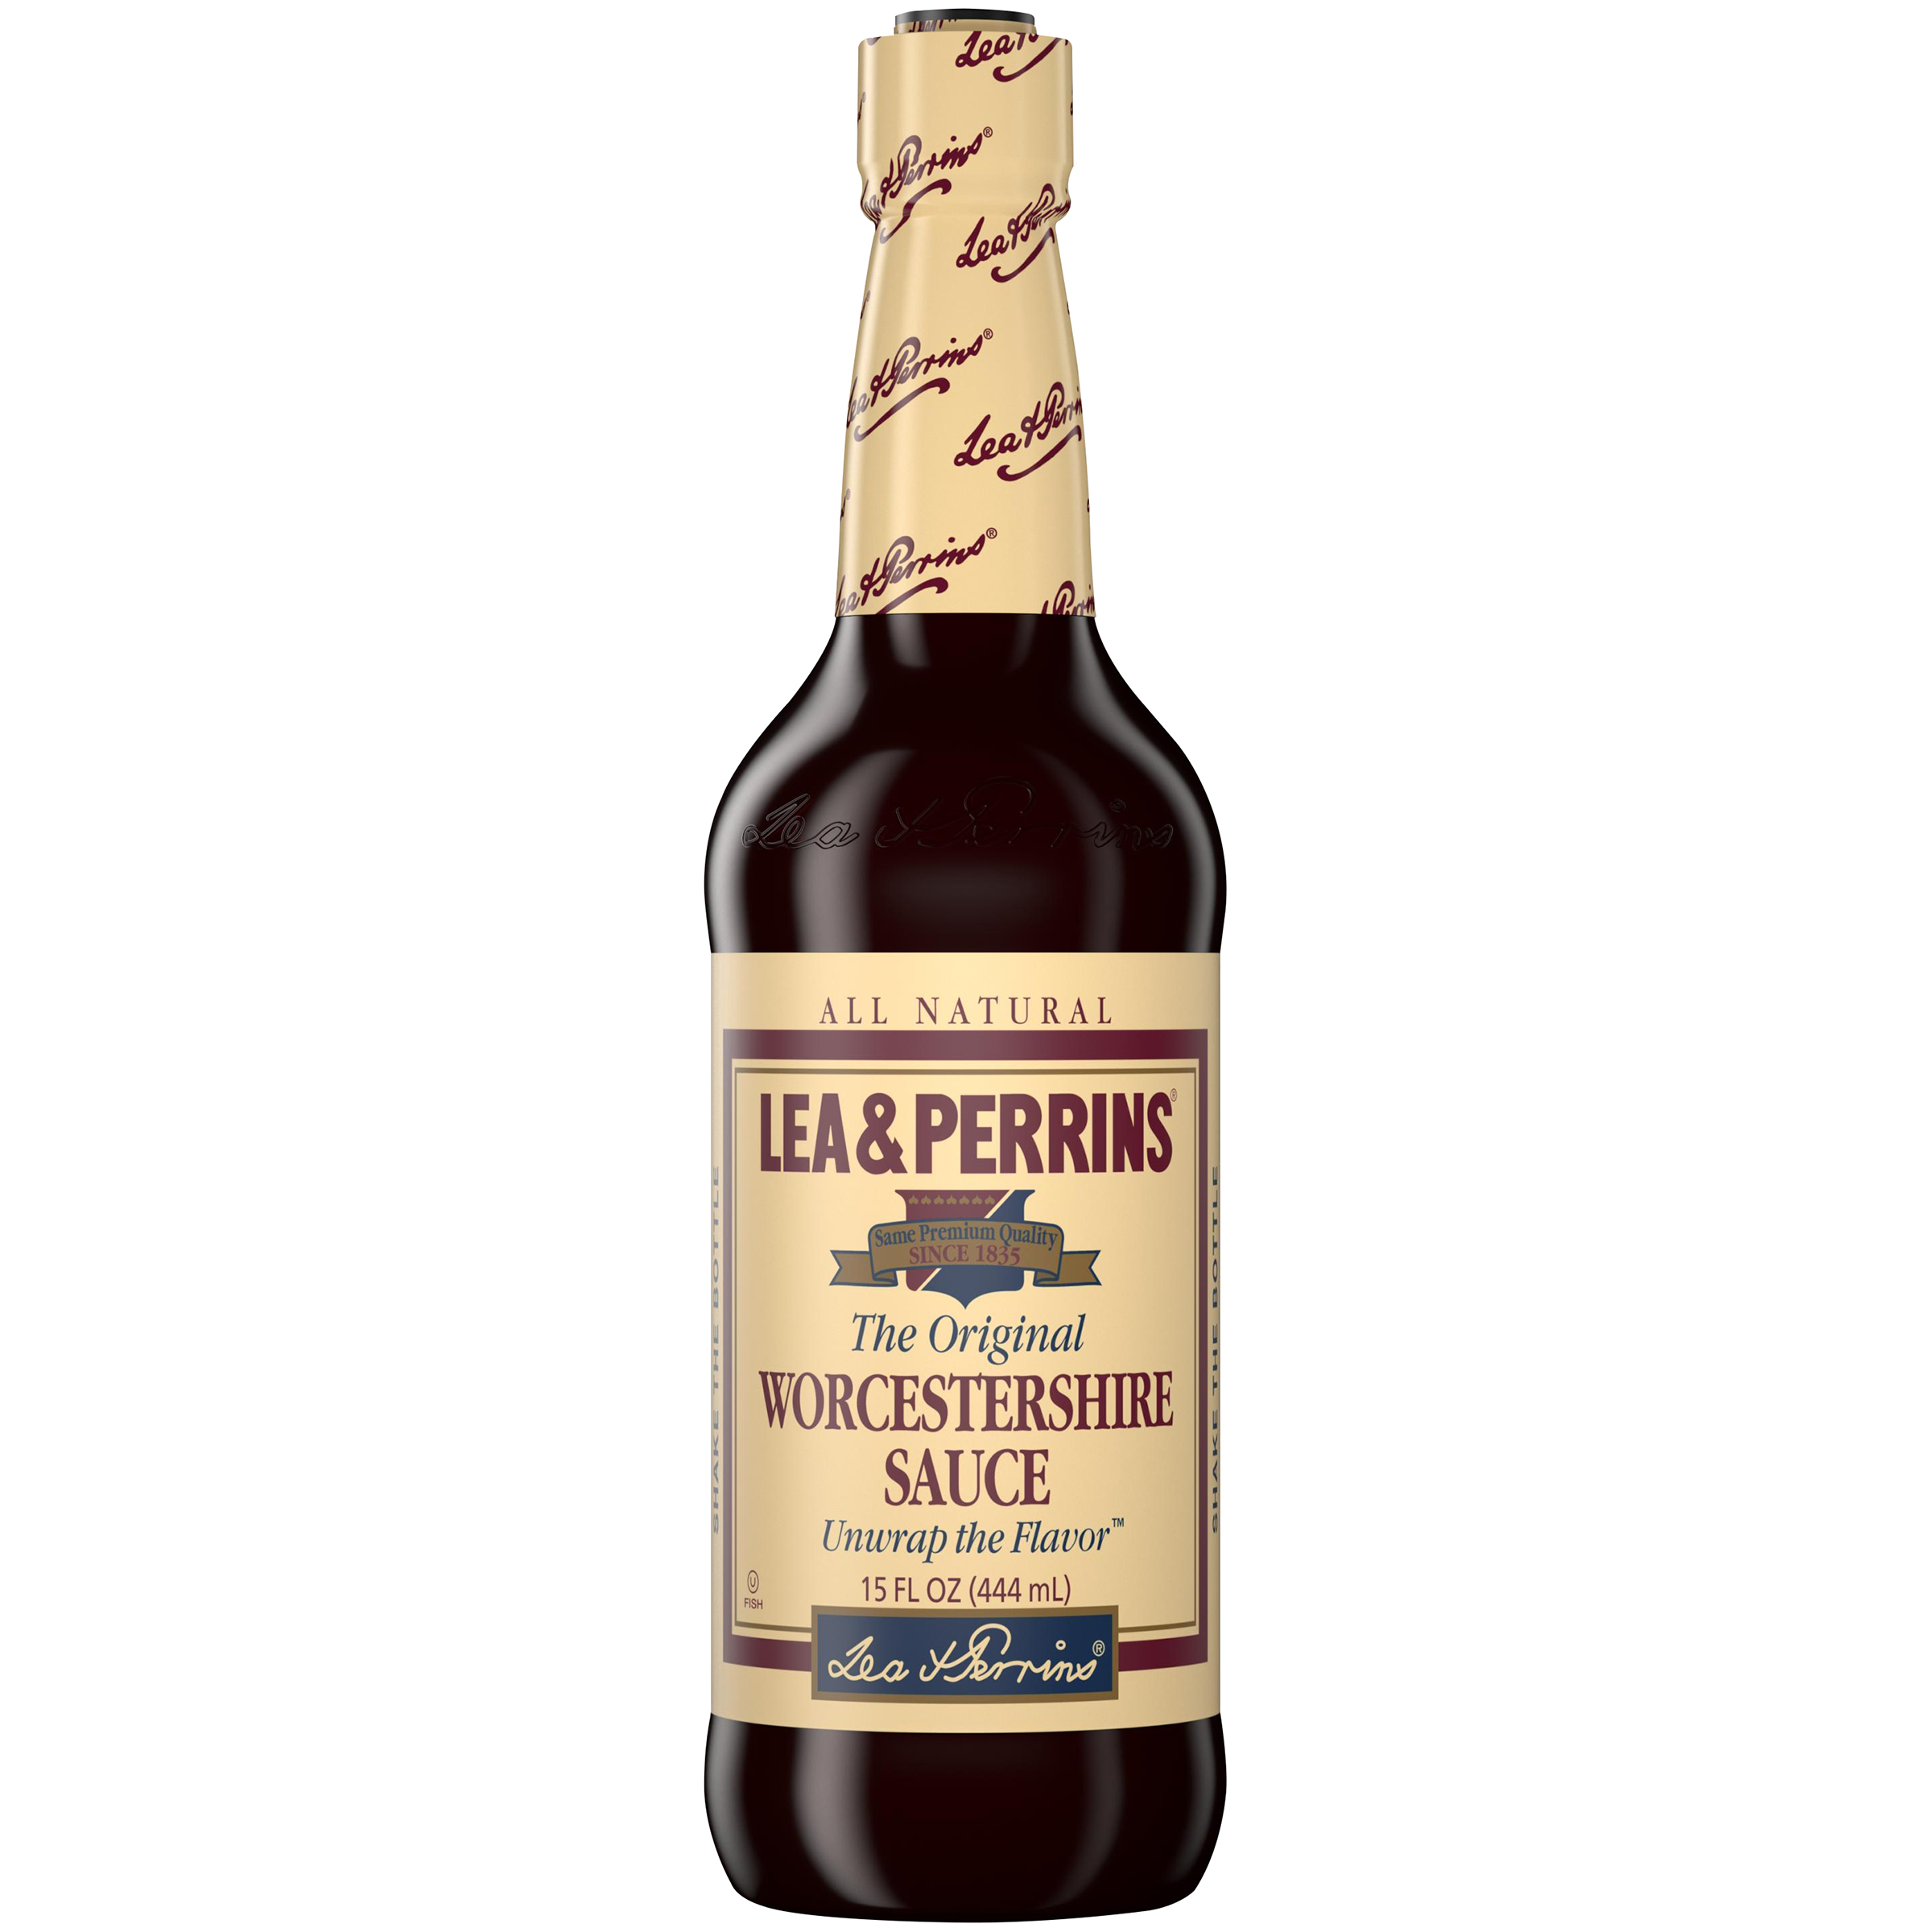 Lea & Perrins? The Original Worcestershire Sauce 15 fl. oz. Bottle